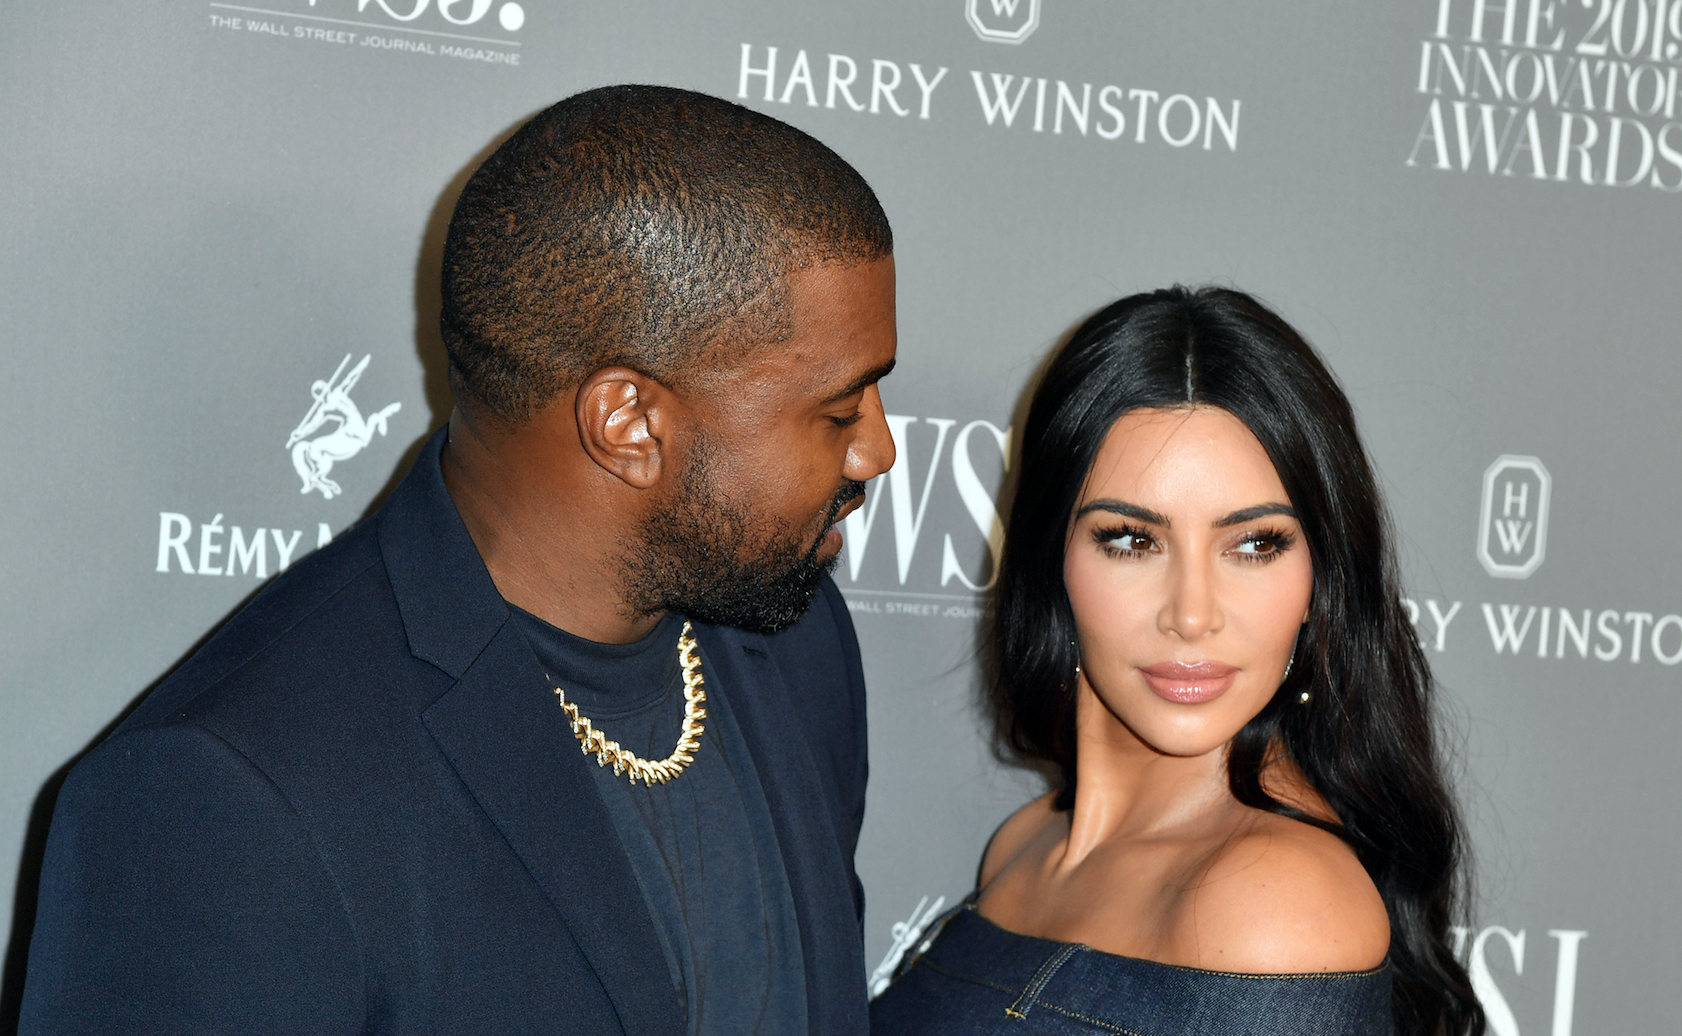 Kim Kardashian Reveals Kanye West's 'Thoughtful' 40th Birthday Gift After Marital Drama